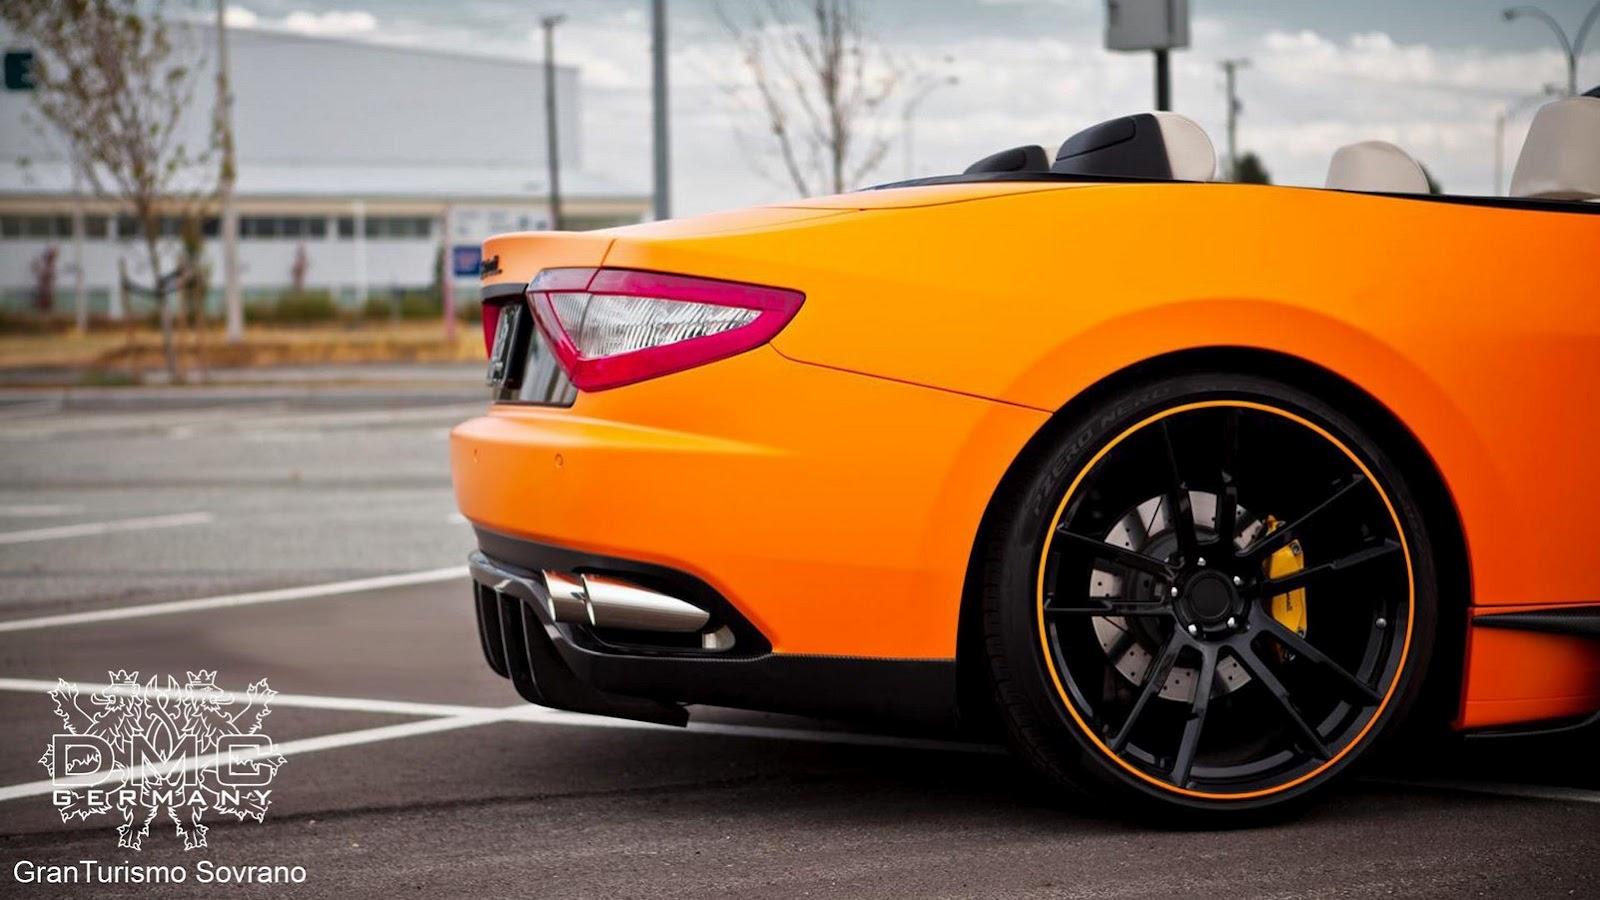 DMC Maserati GranCabrio Supercharger Tuning 6   Car Tuning HD Wallpaper